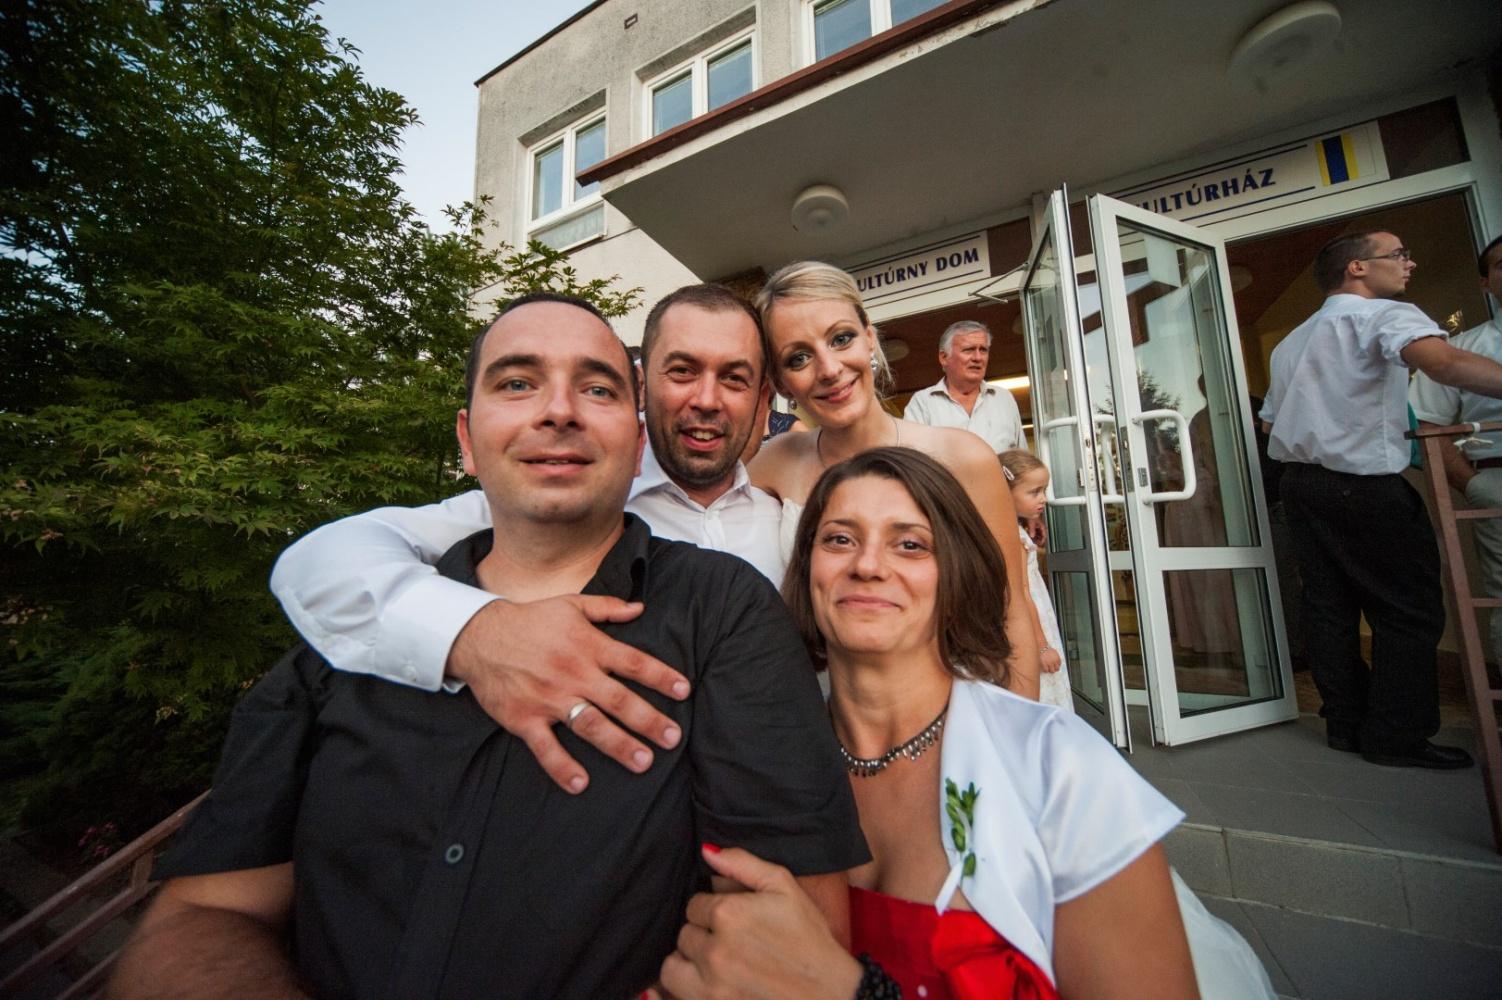 http://www.fotoz.sk/images/gallery-21/normal/svadobne-fotenie_eskuvoi-fotos_258.jpg